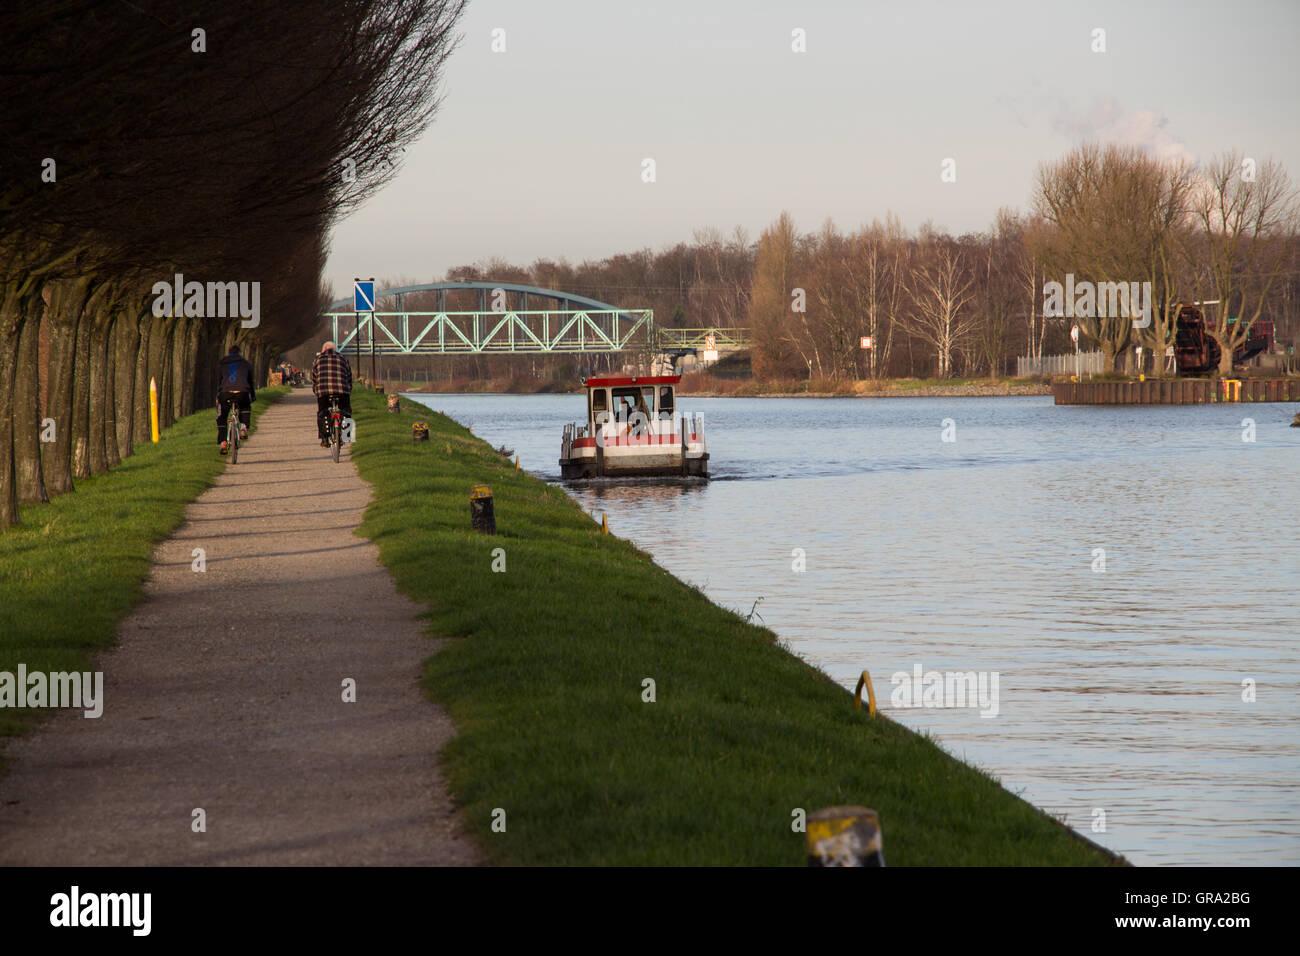 Dortmund-Ems-Canal - Stock Image